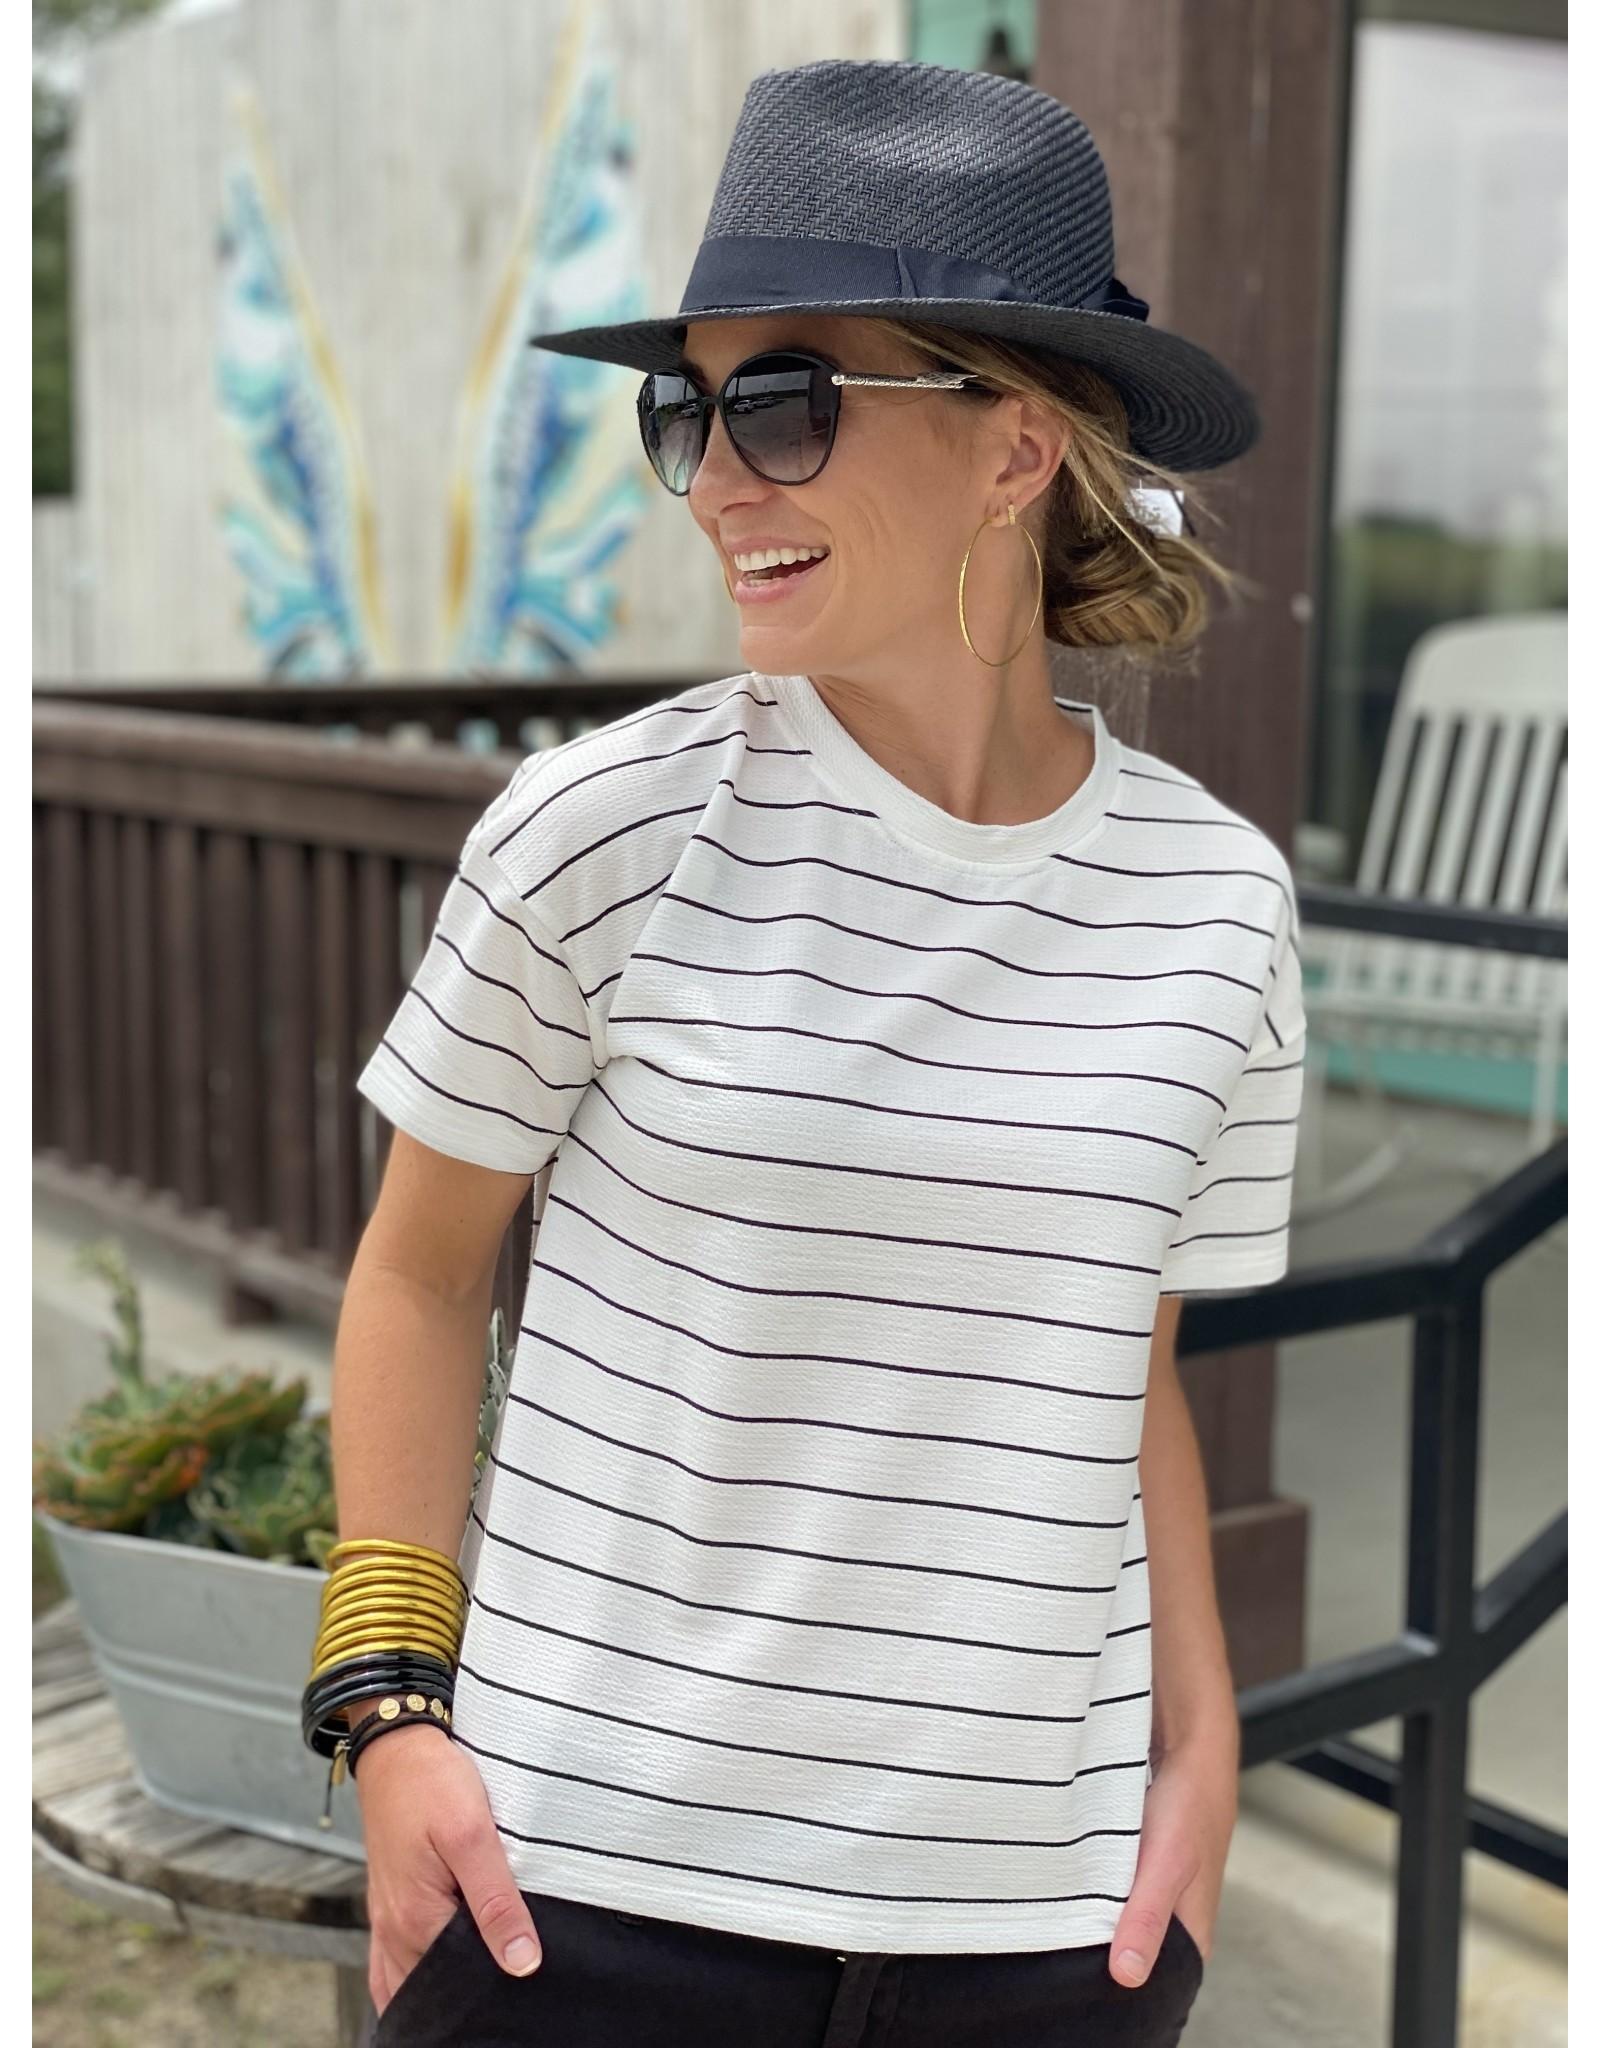 Ivory & Black Stripe Top